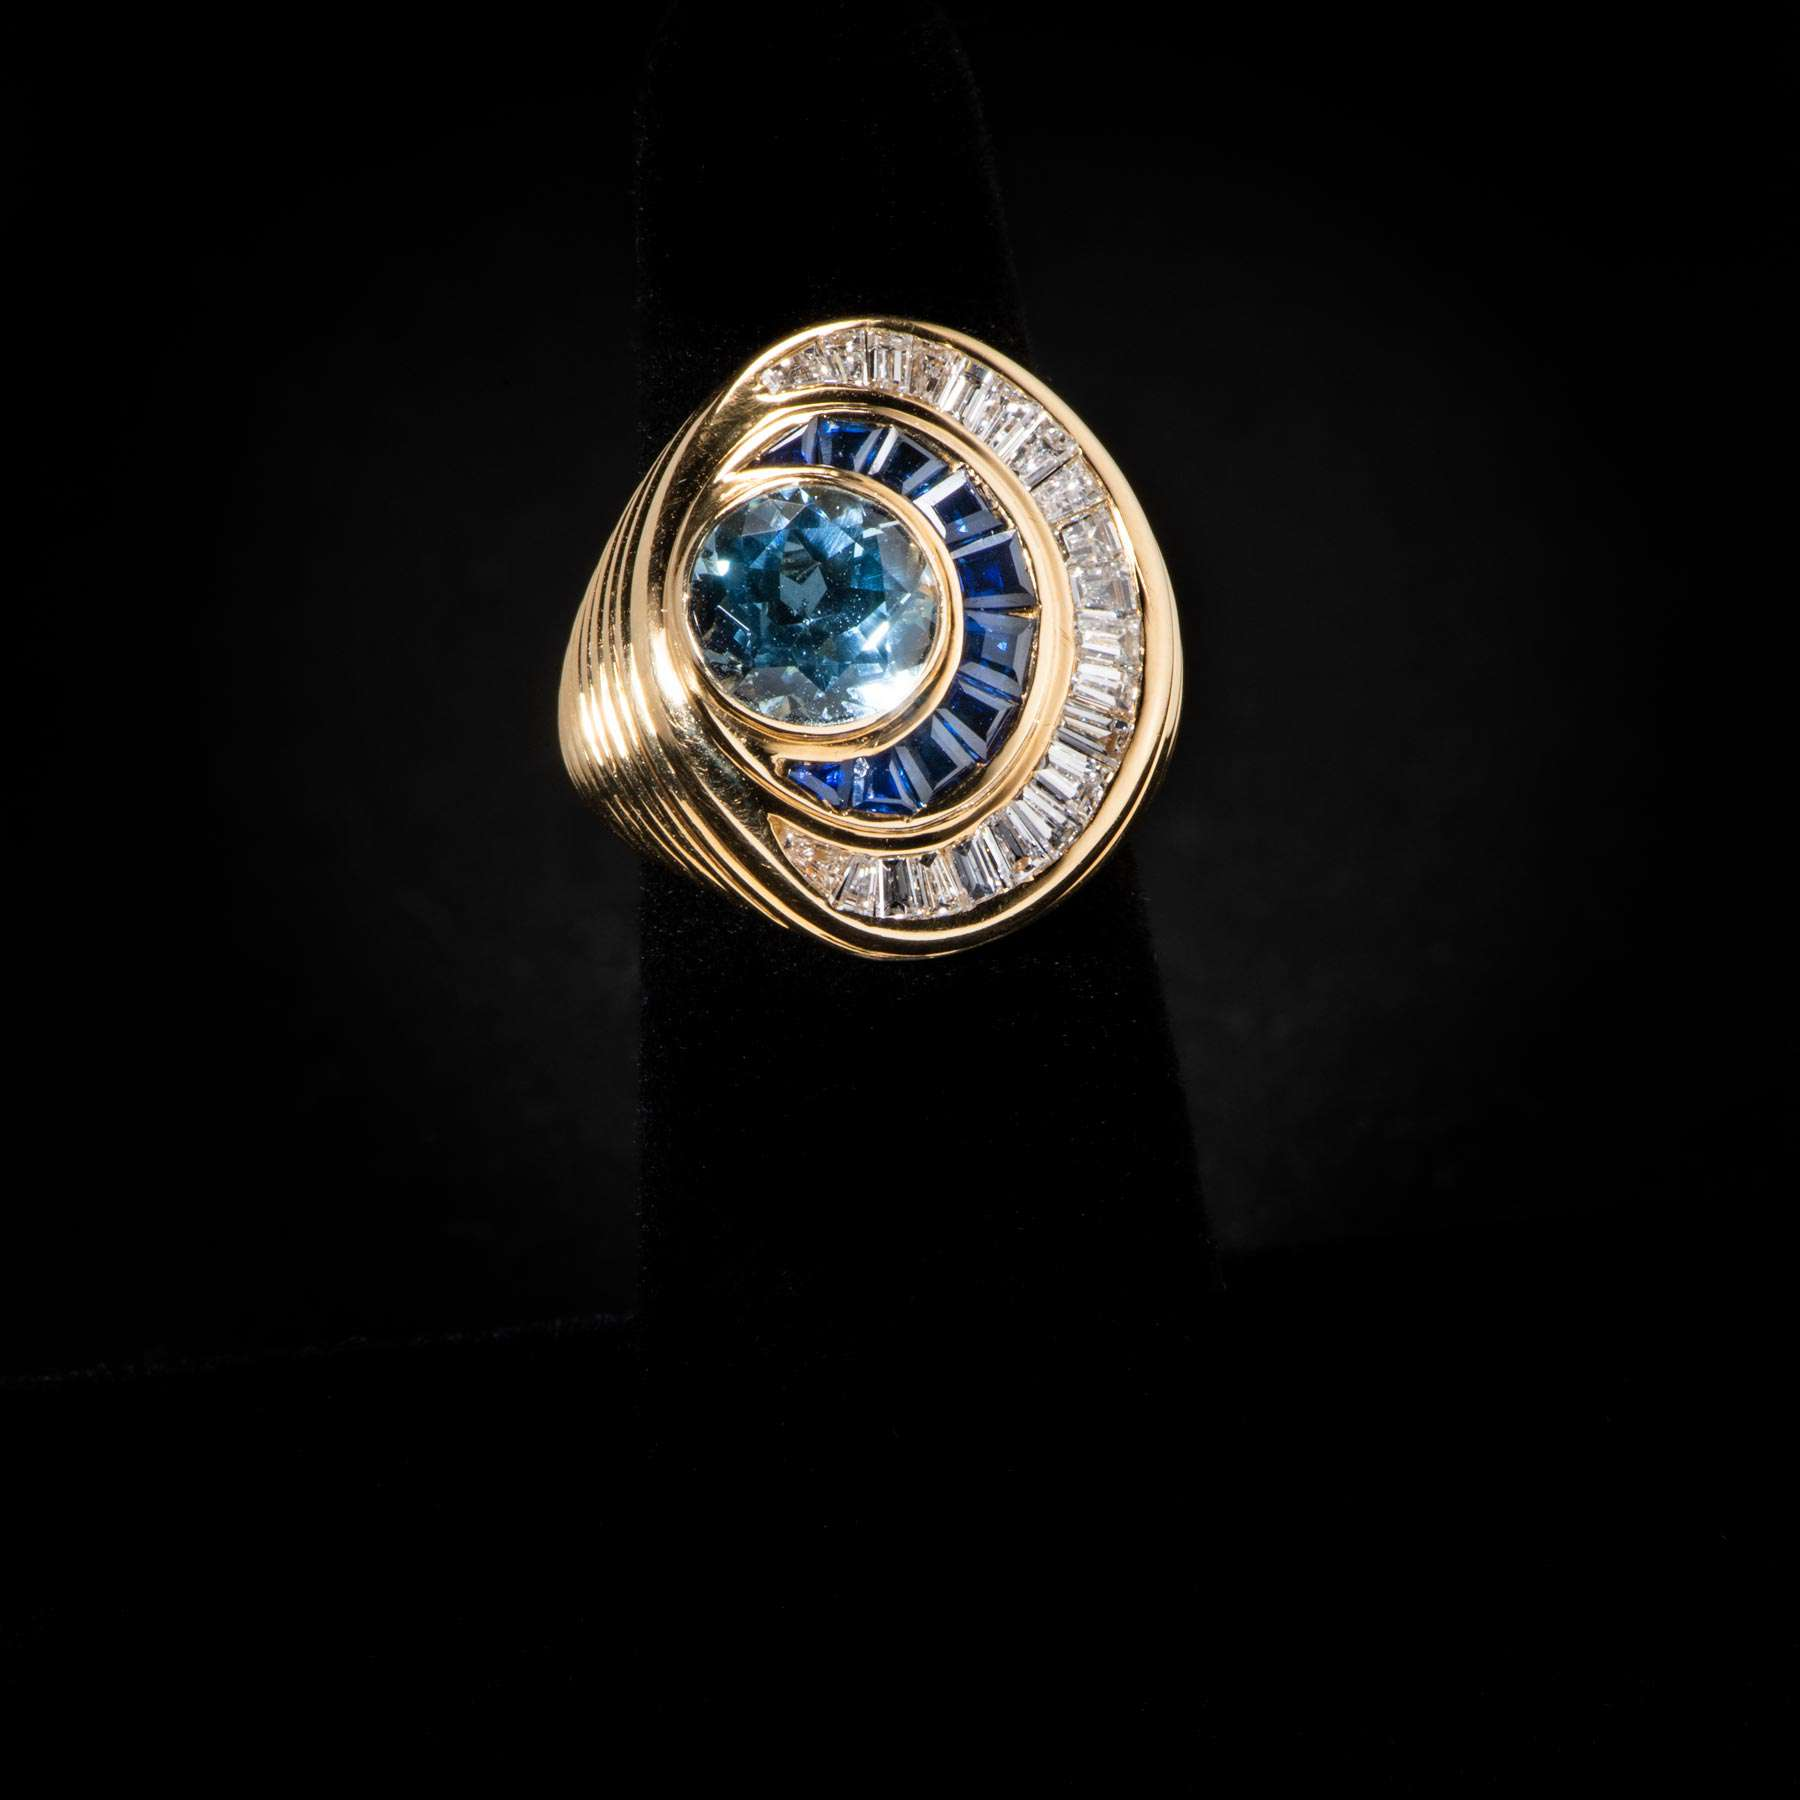 10-64IEX 18K Carven French Ring W Brilliant Cut Aqua Marine & Saphire and Dias. Baguettes